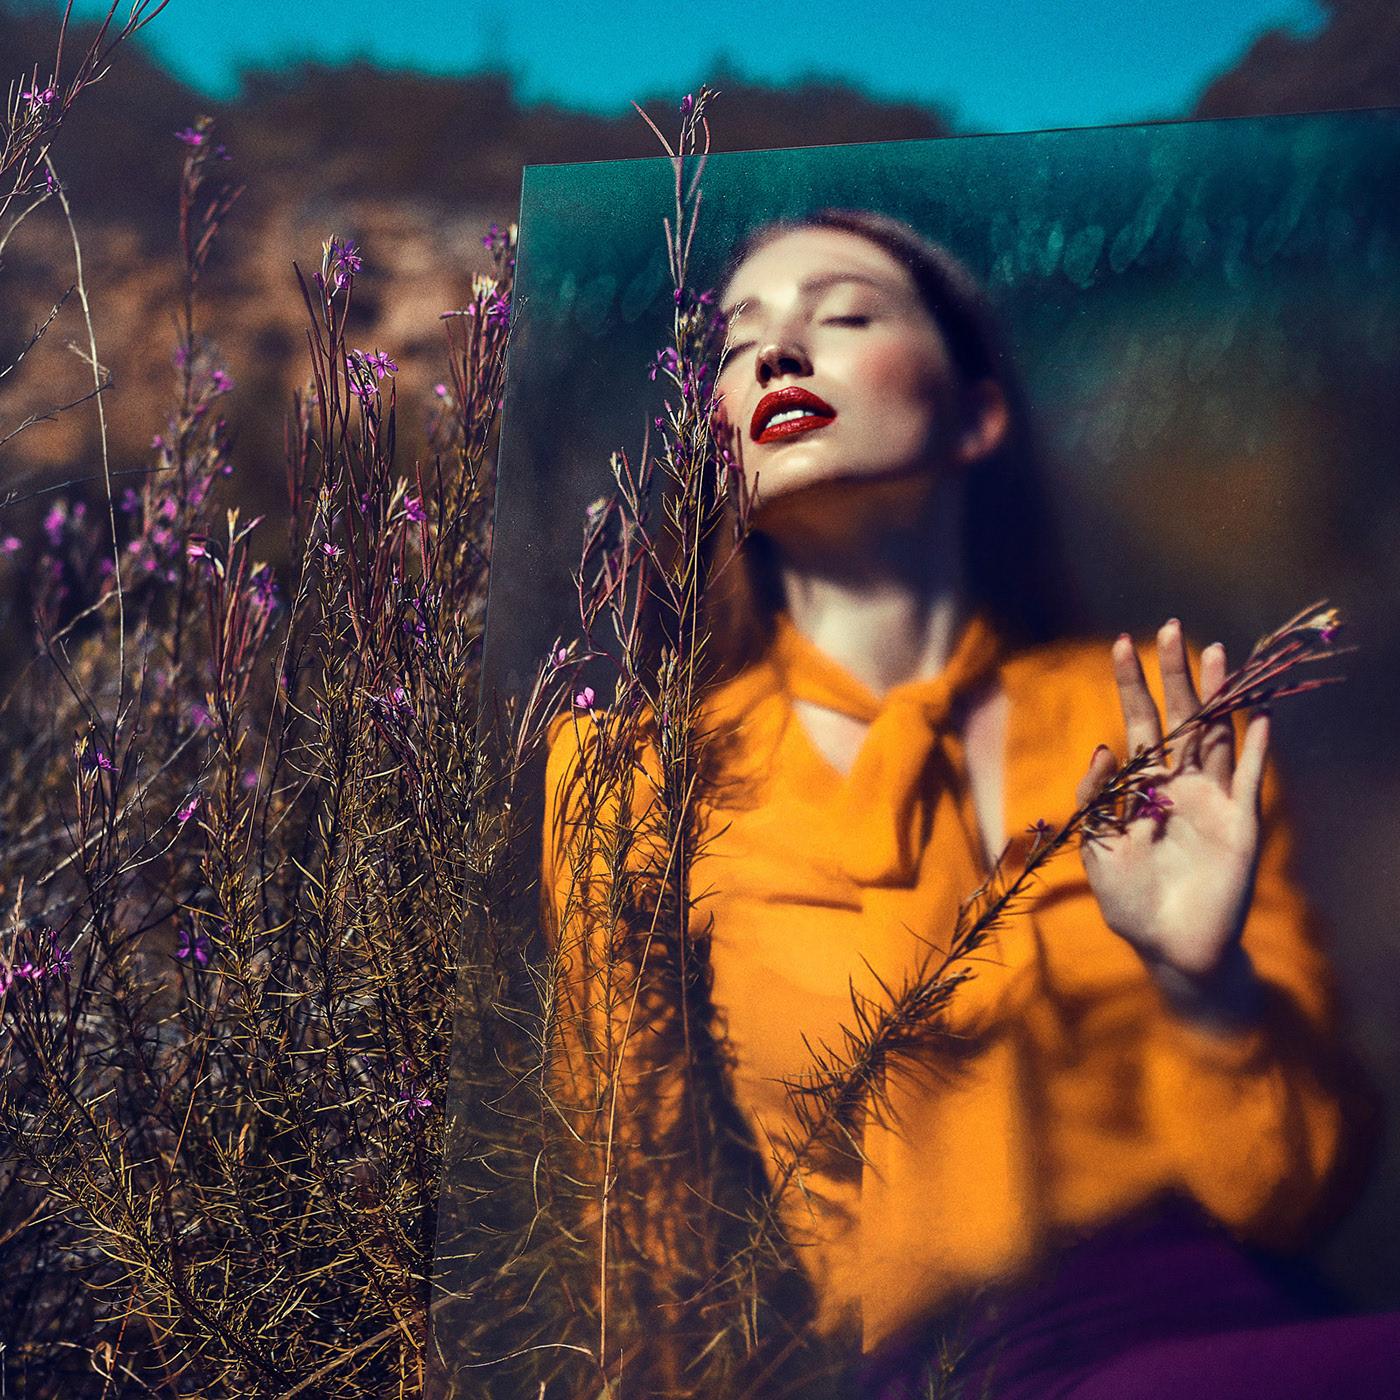 GALINA / фотограф Simona Smrckova